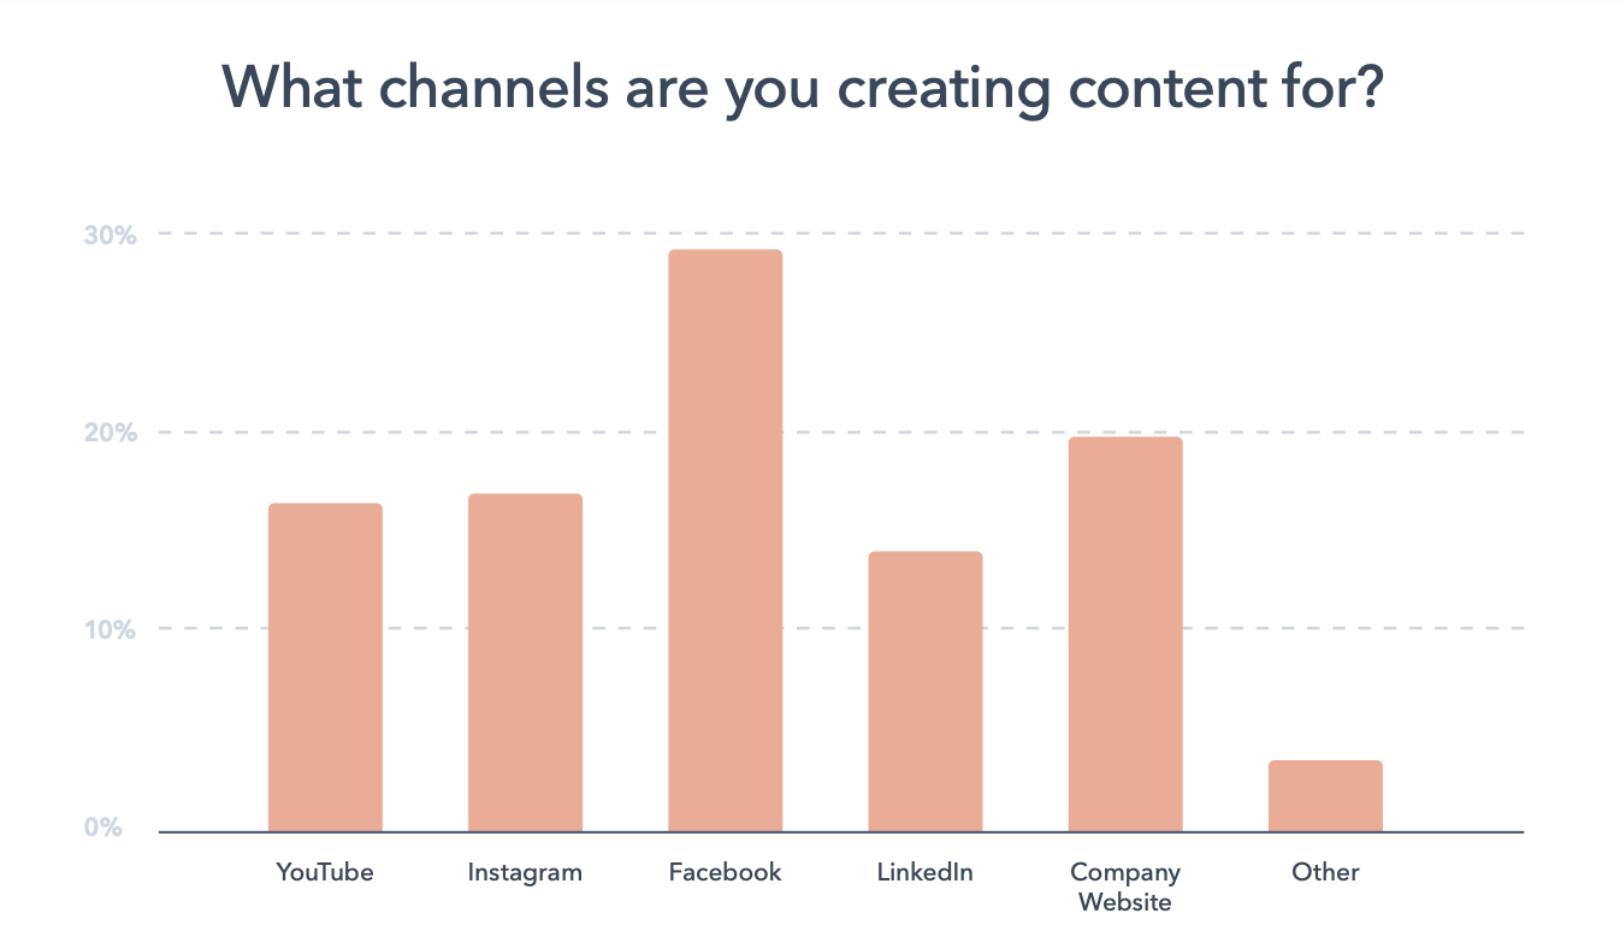 Content creation channels